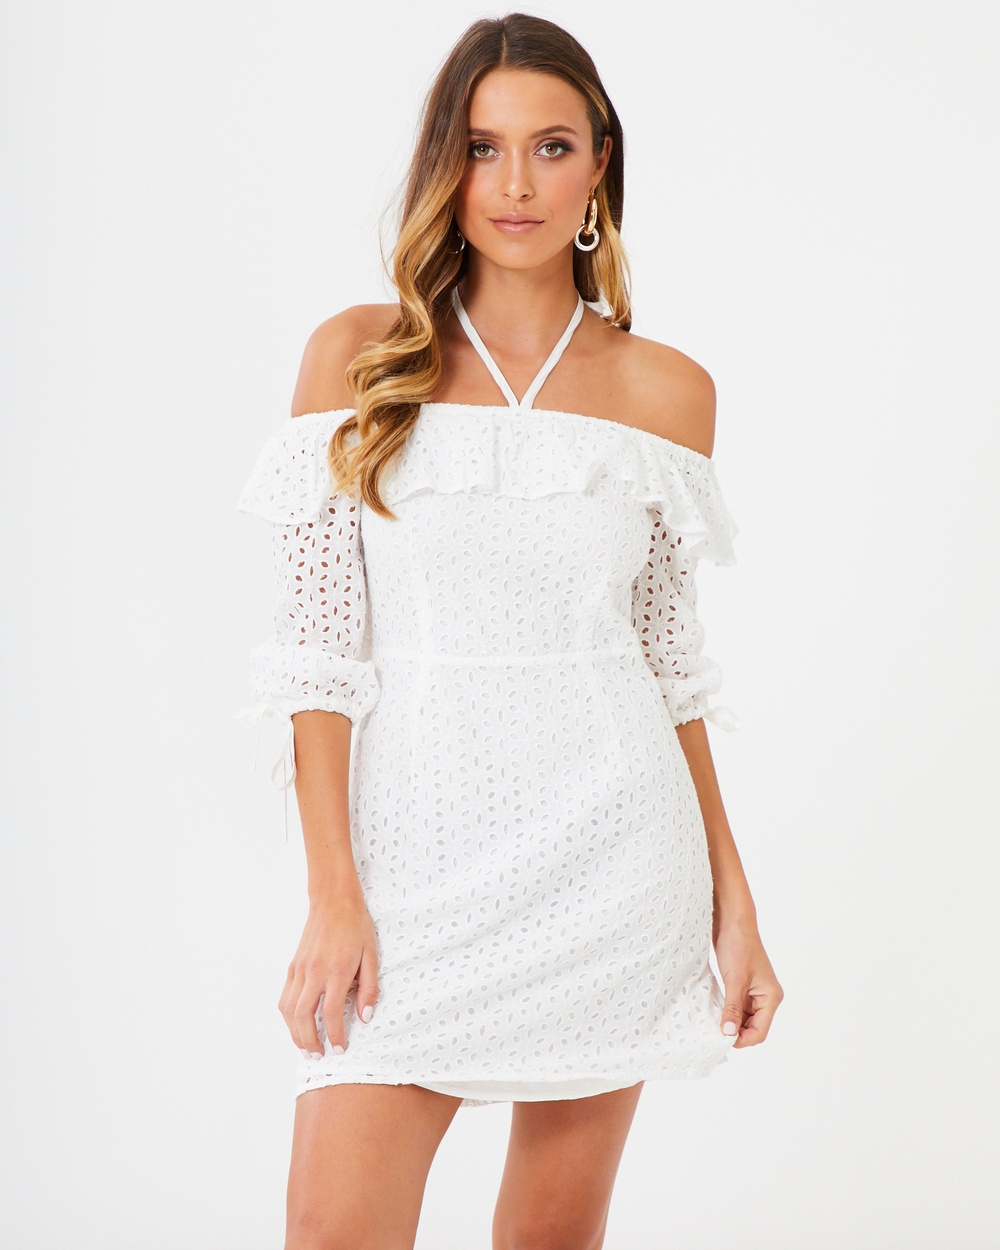 Photo of Calli White Lace Scarlett Dress - buy Calli dresses on sale online